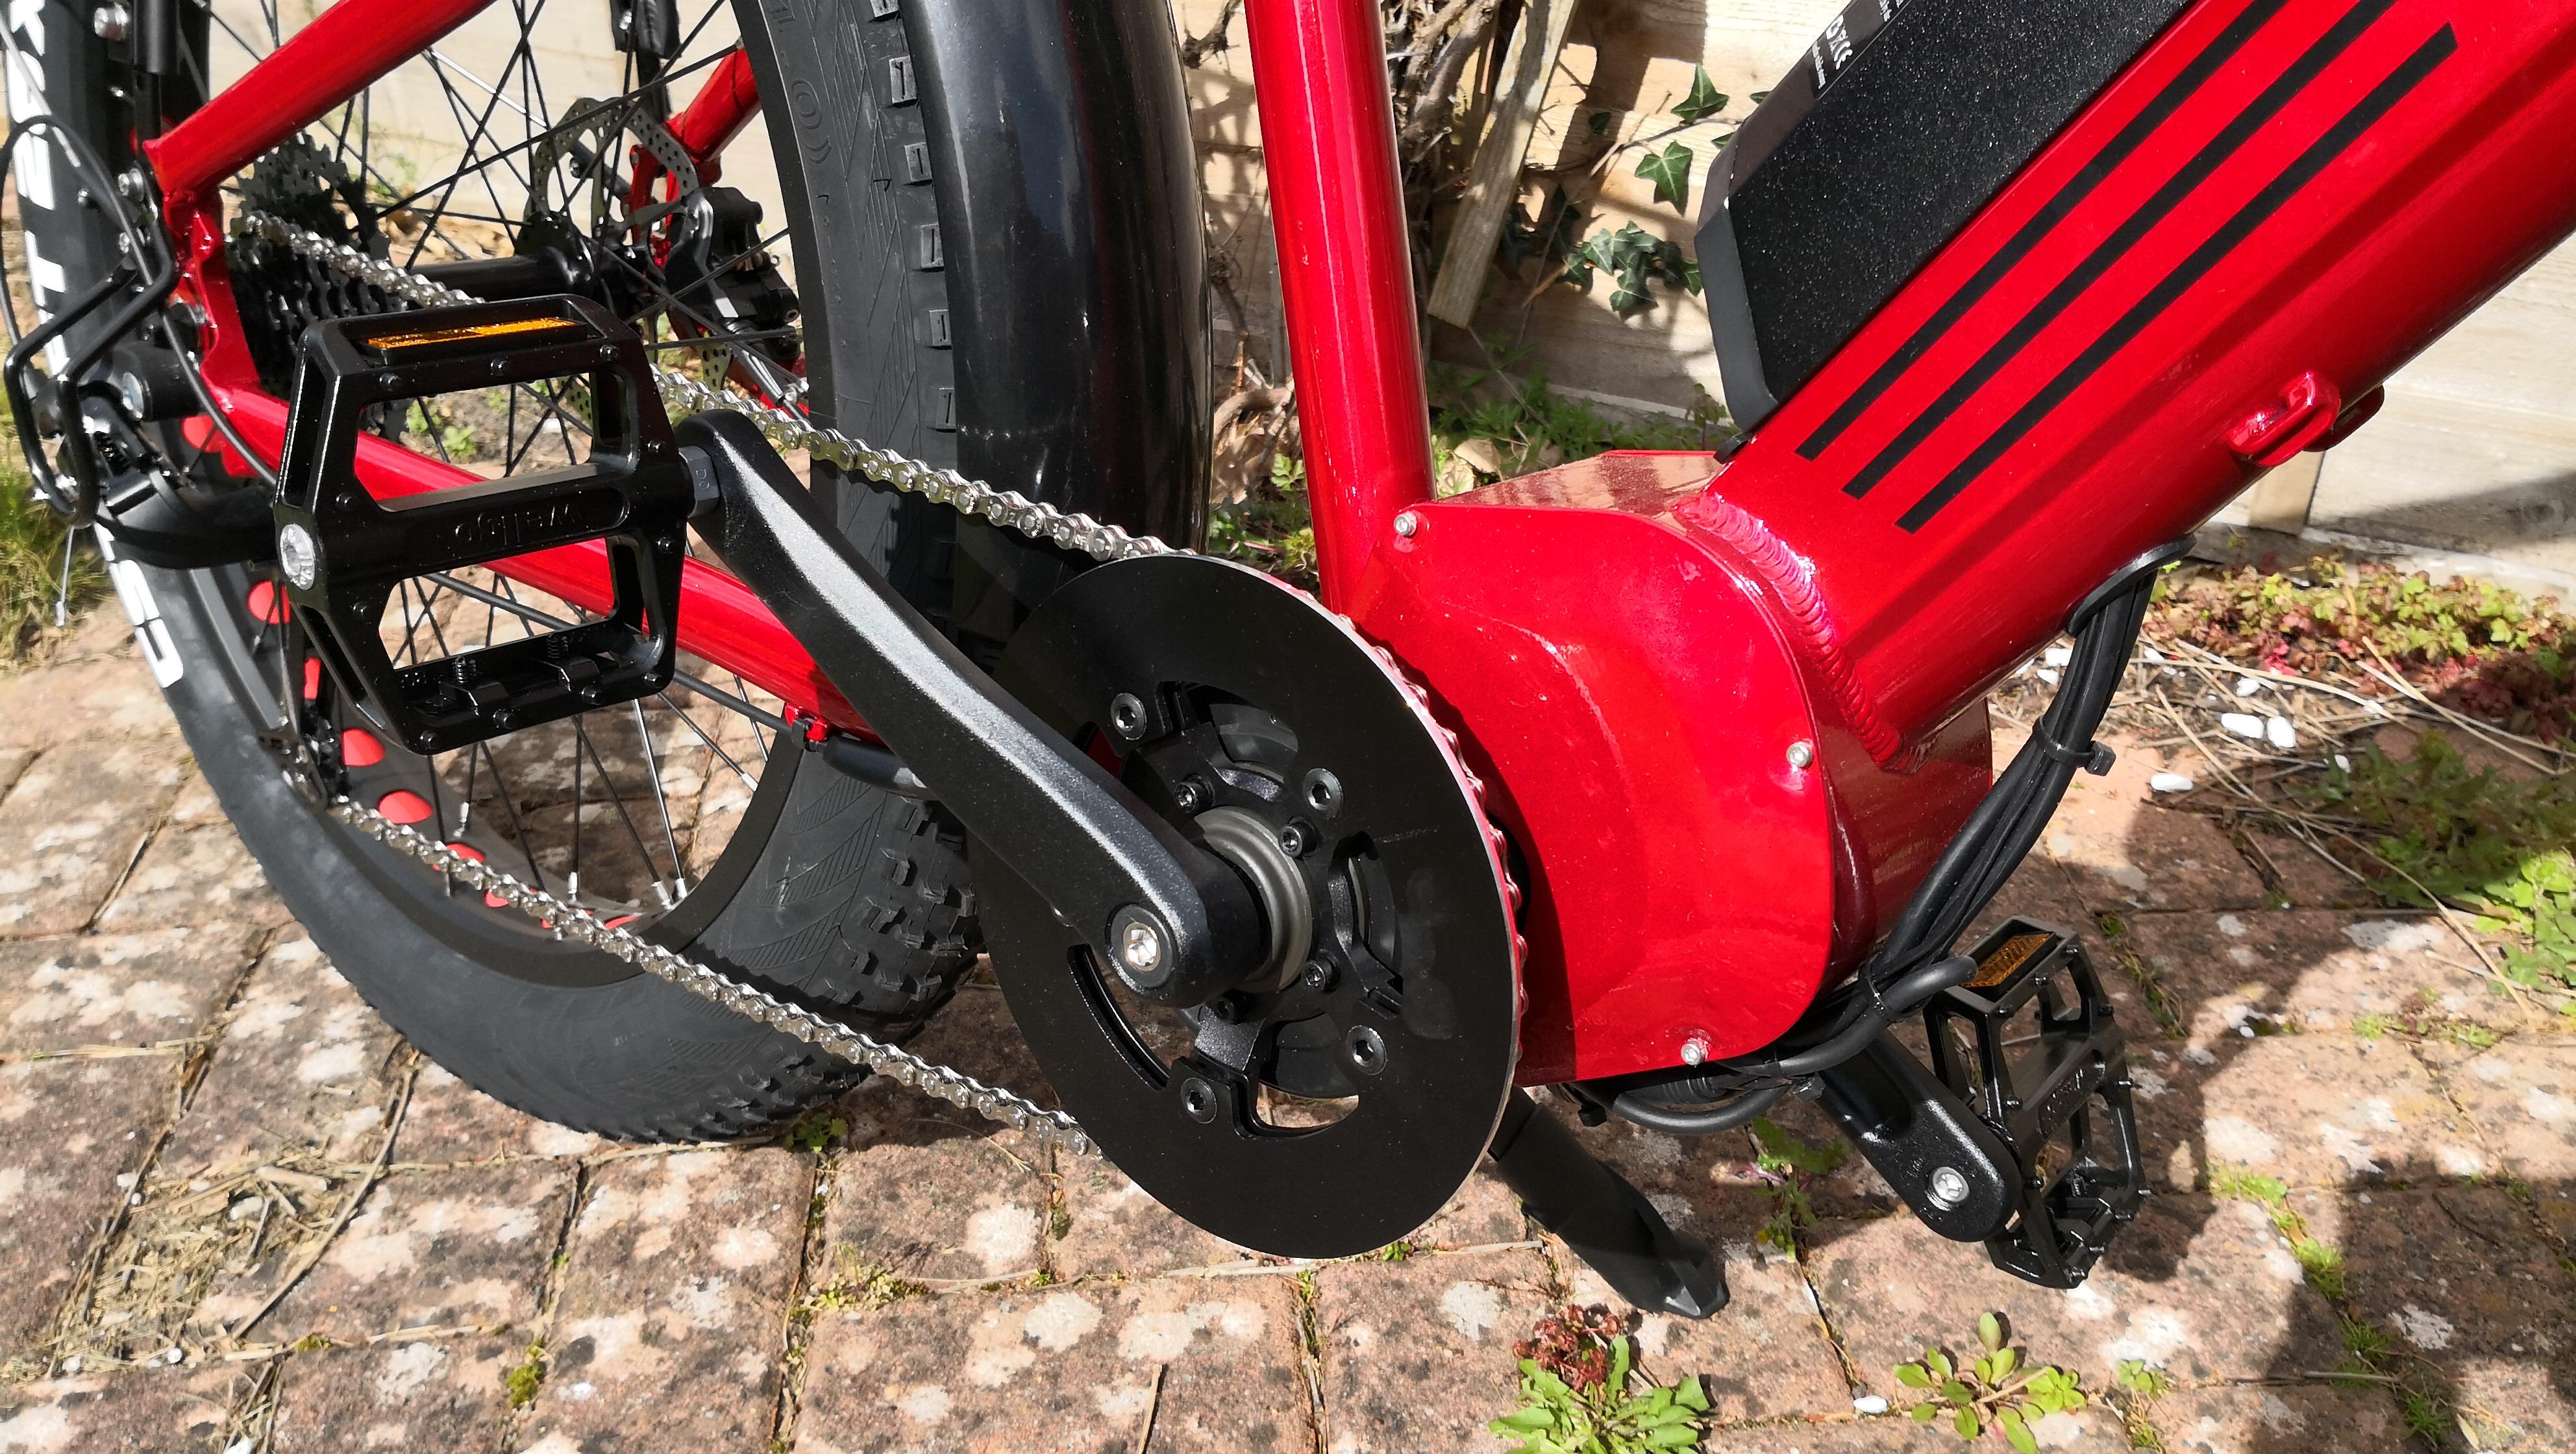 Biktrix Juggernaut Classic